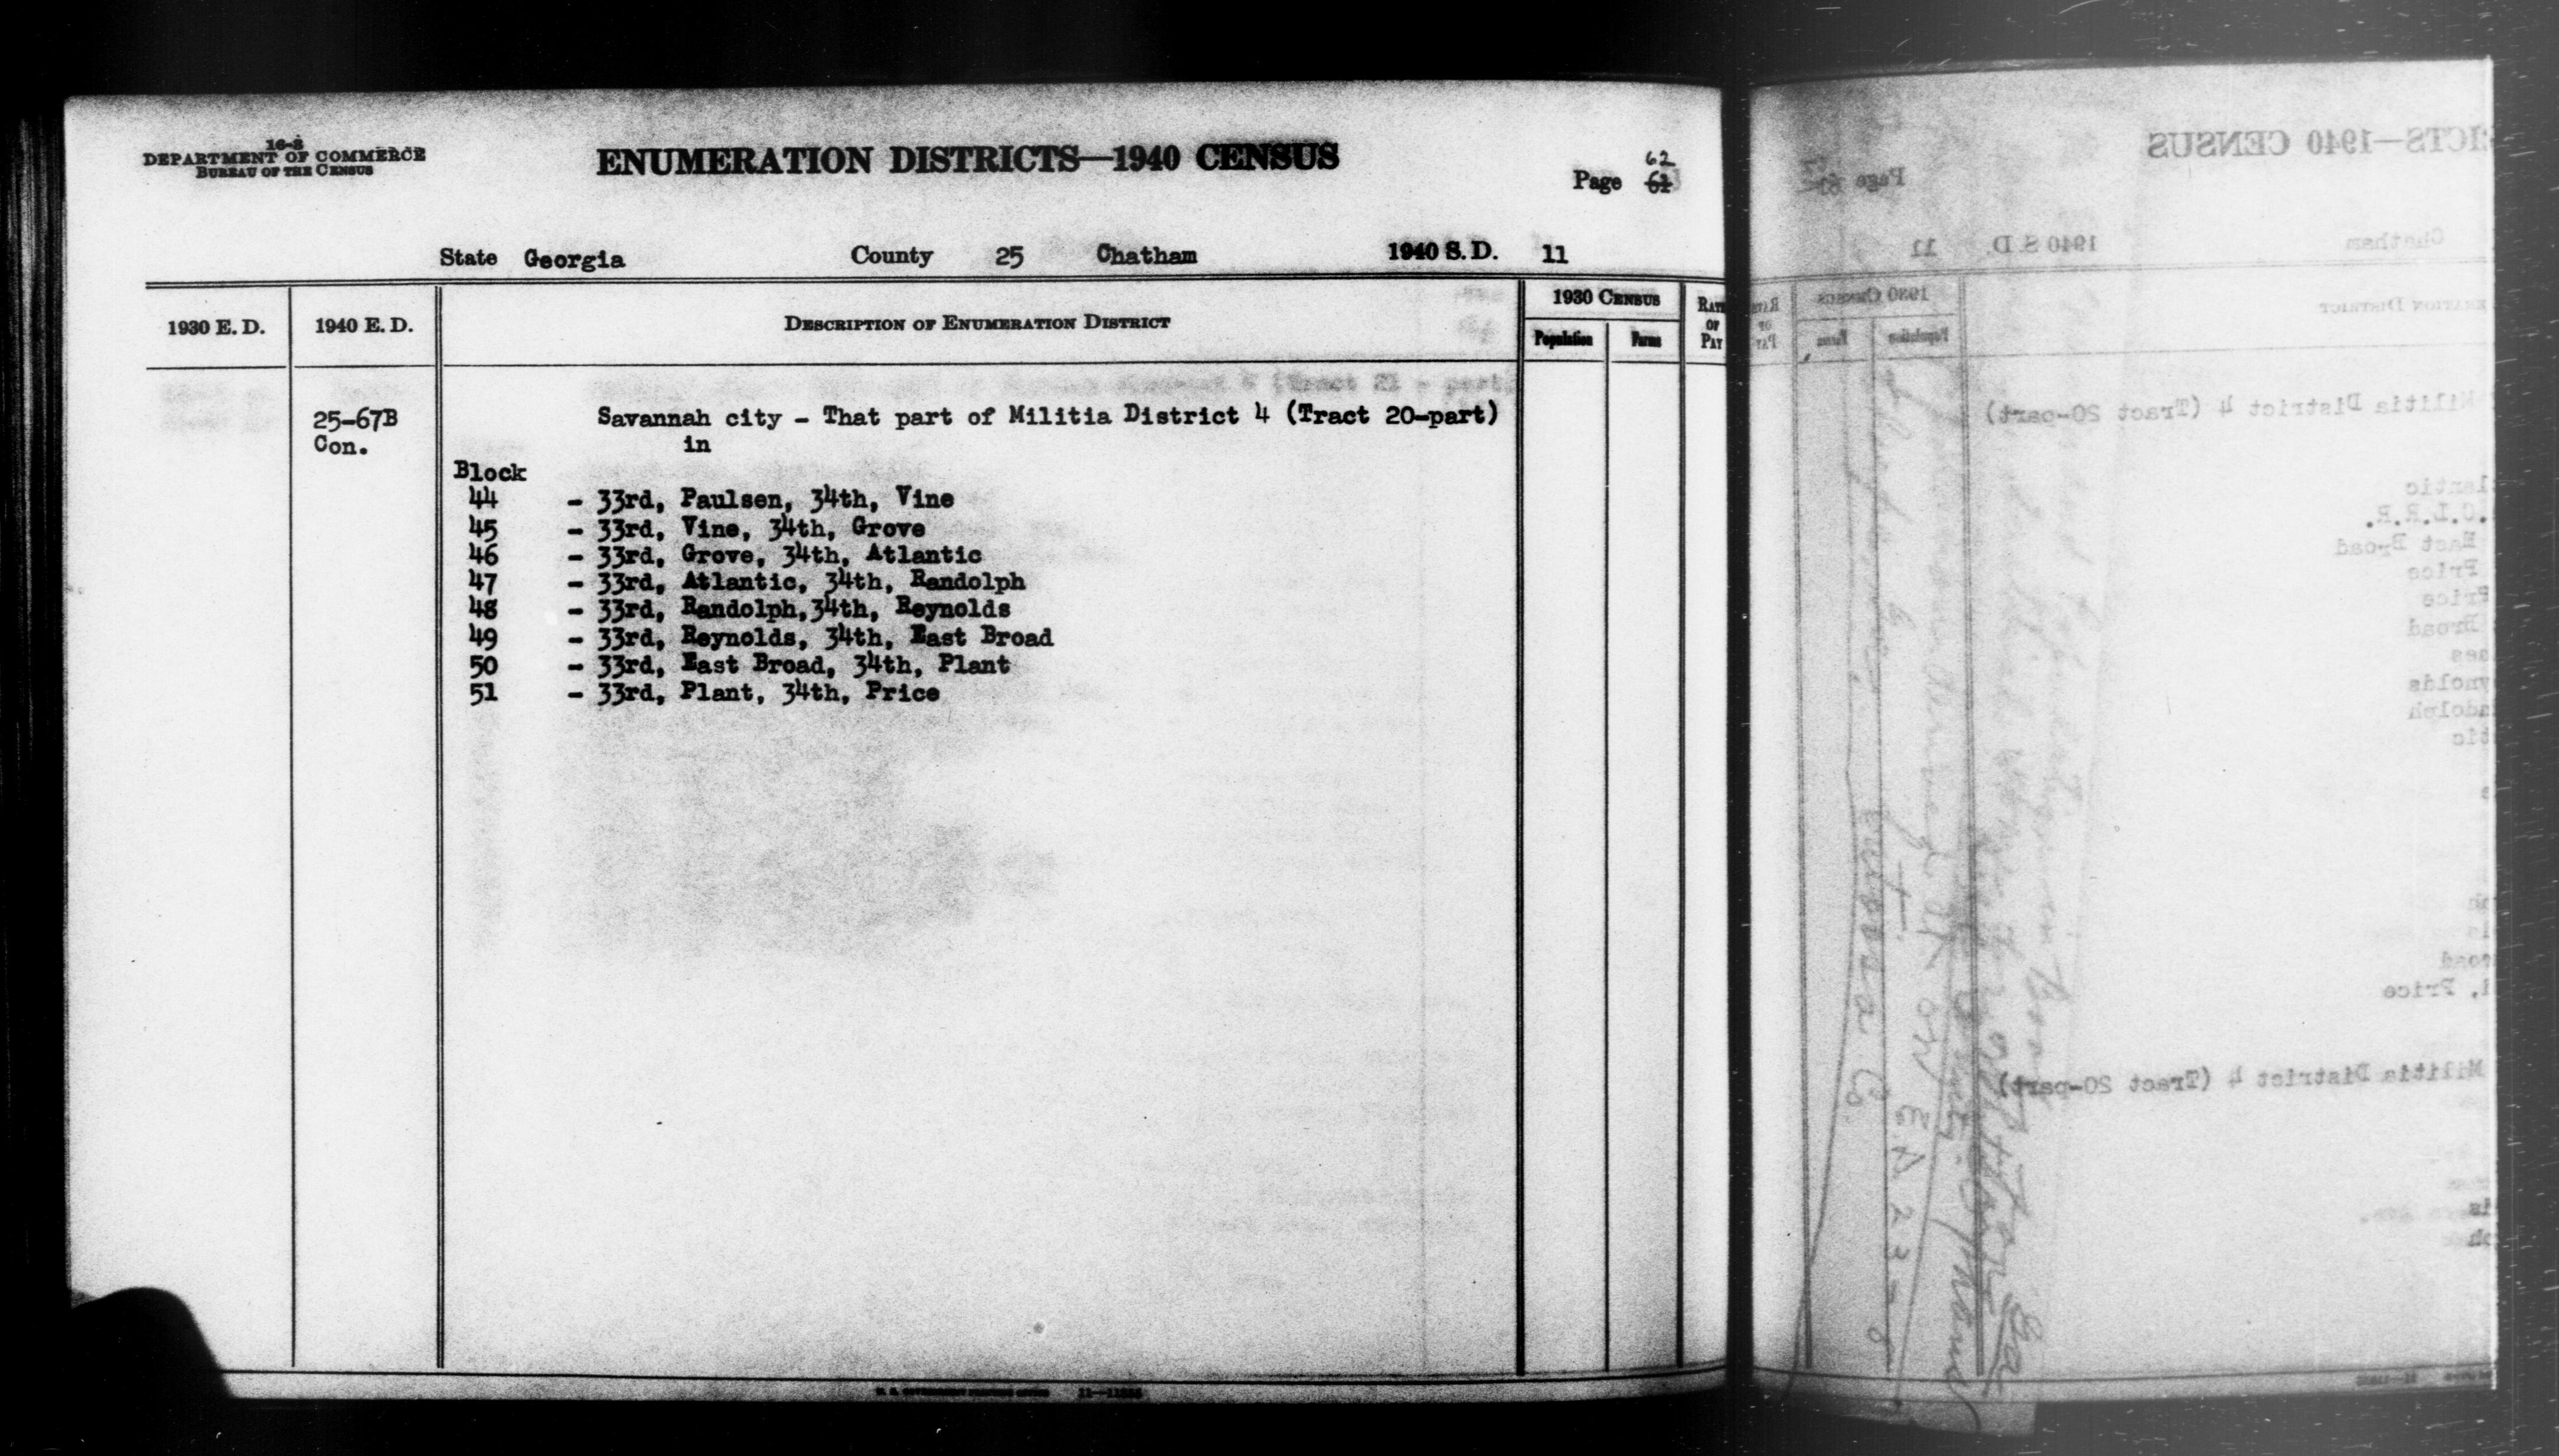 1940 Census Enumeration District Descriptions - Georgia - Chatham County - ED 25-67B